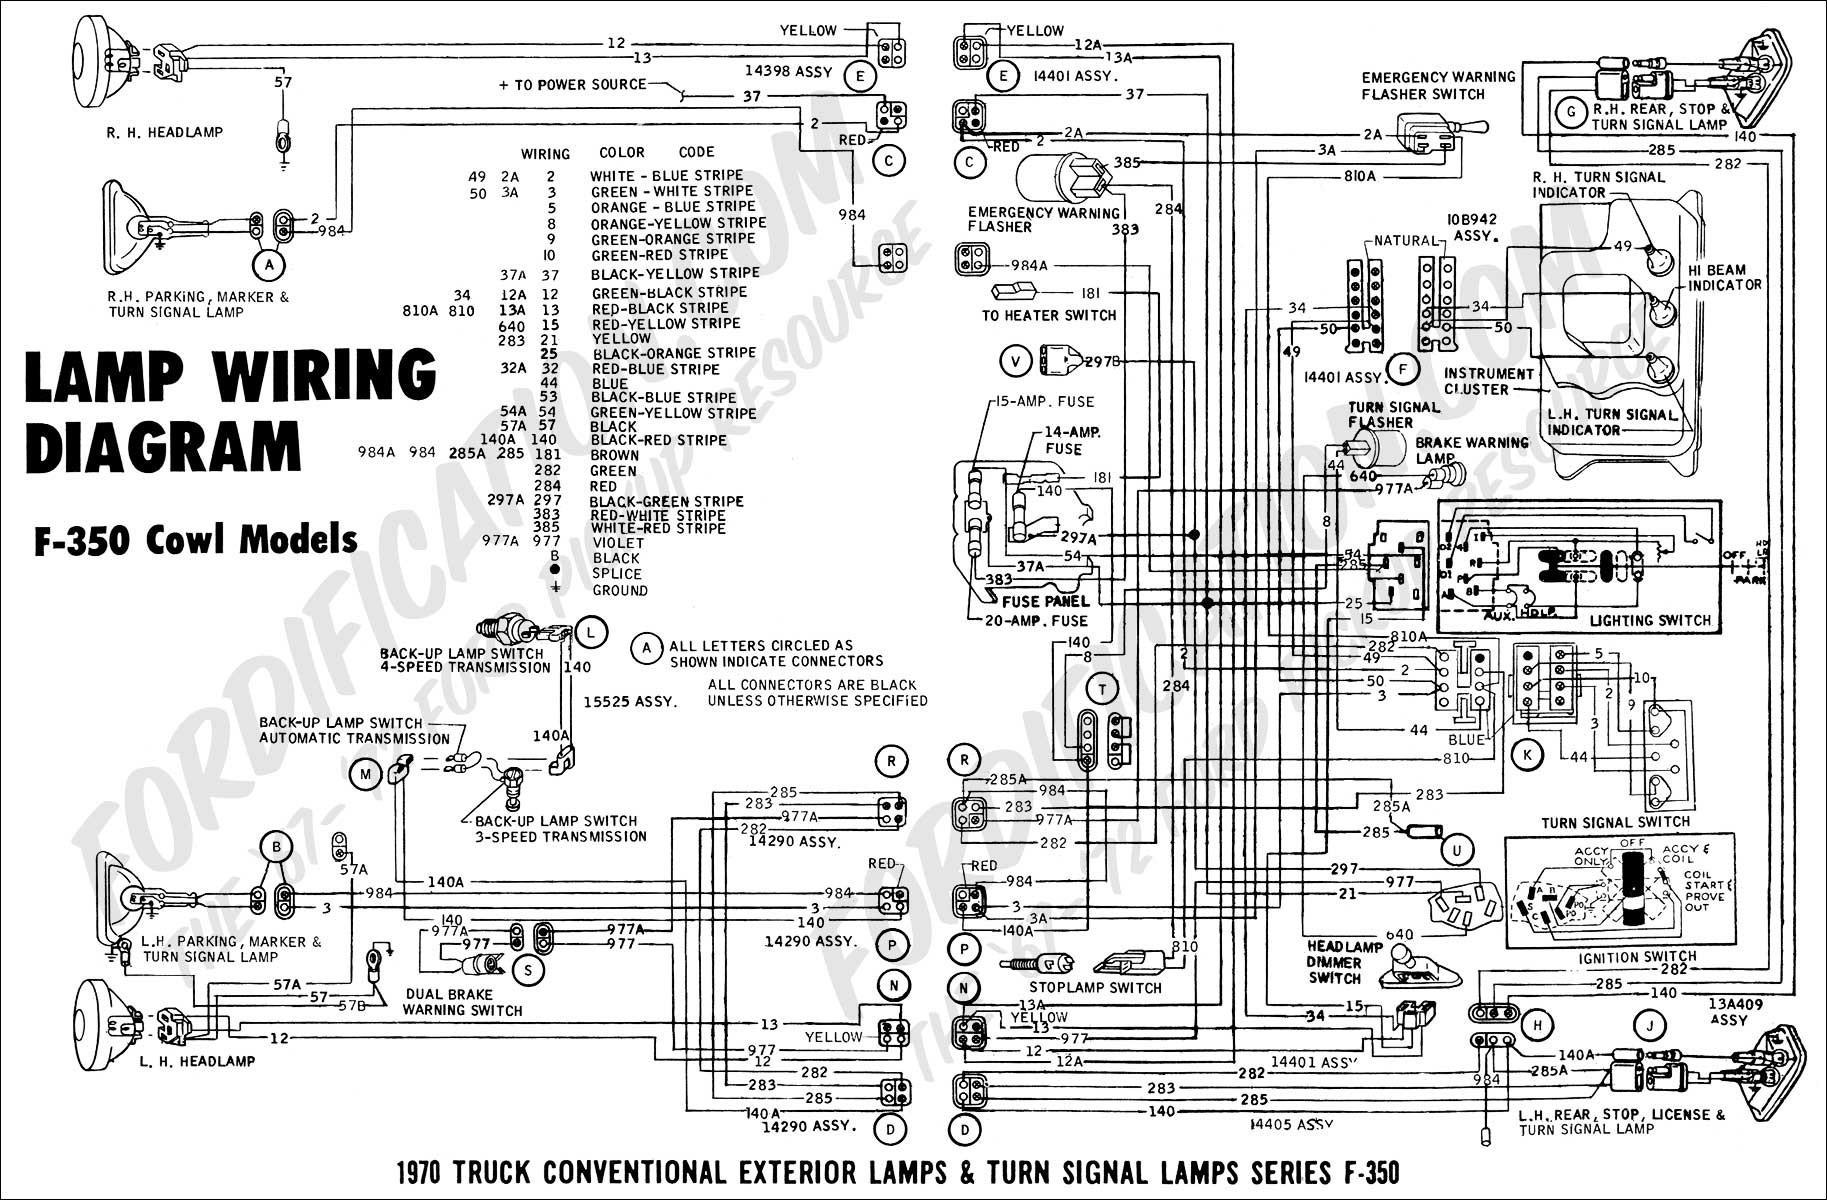 Ford E350 Wiring Diagram Luxury F350 Diagrams Schematics 5